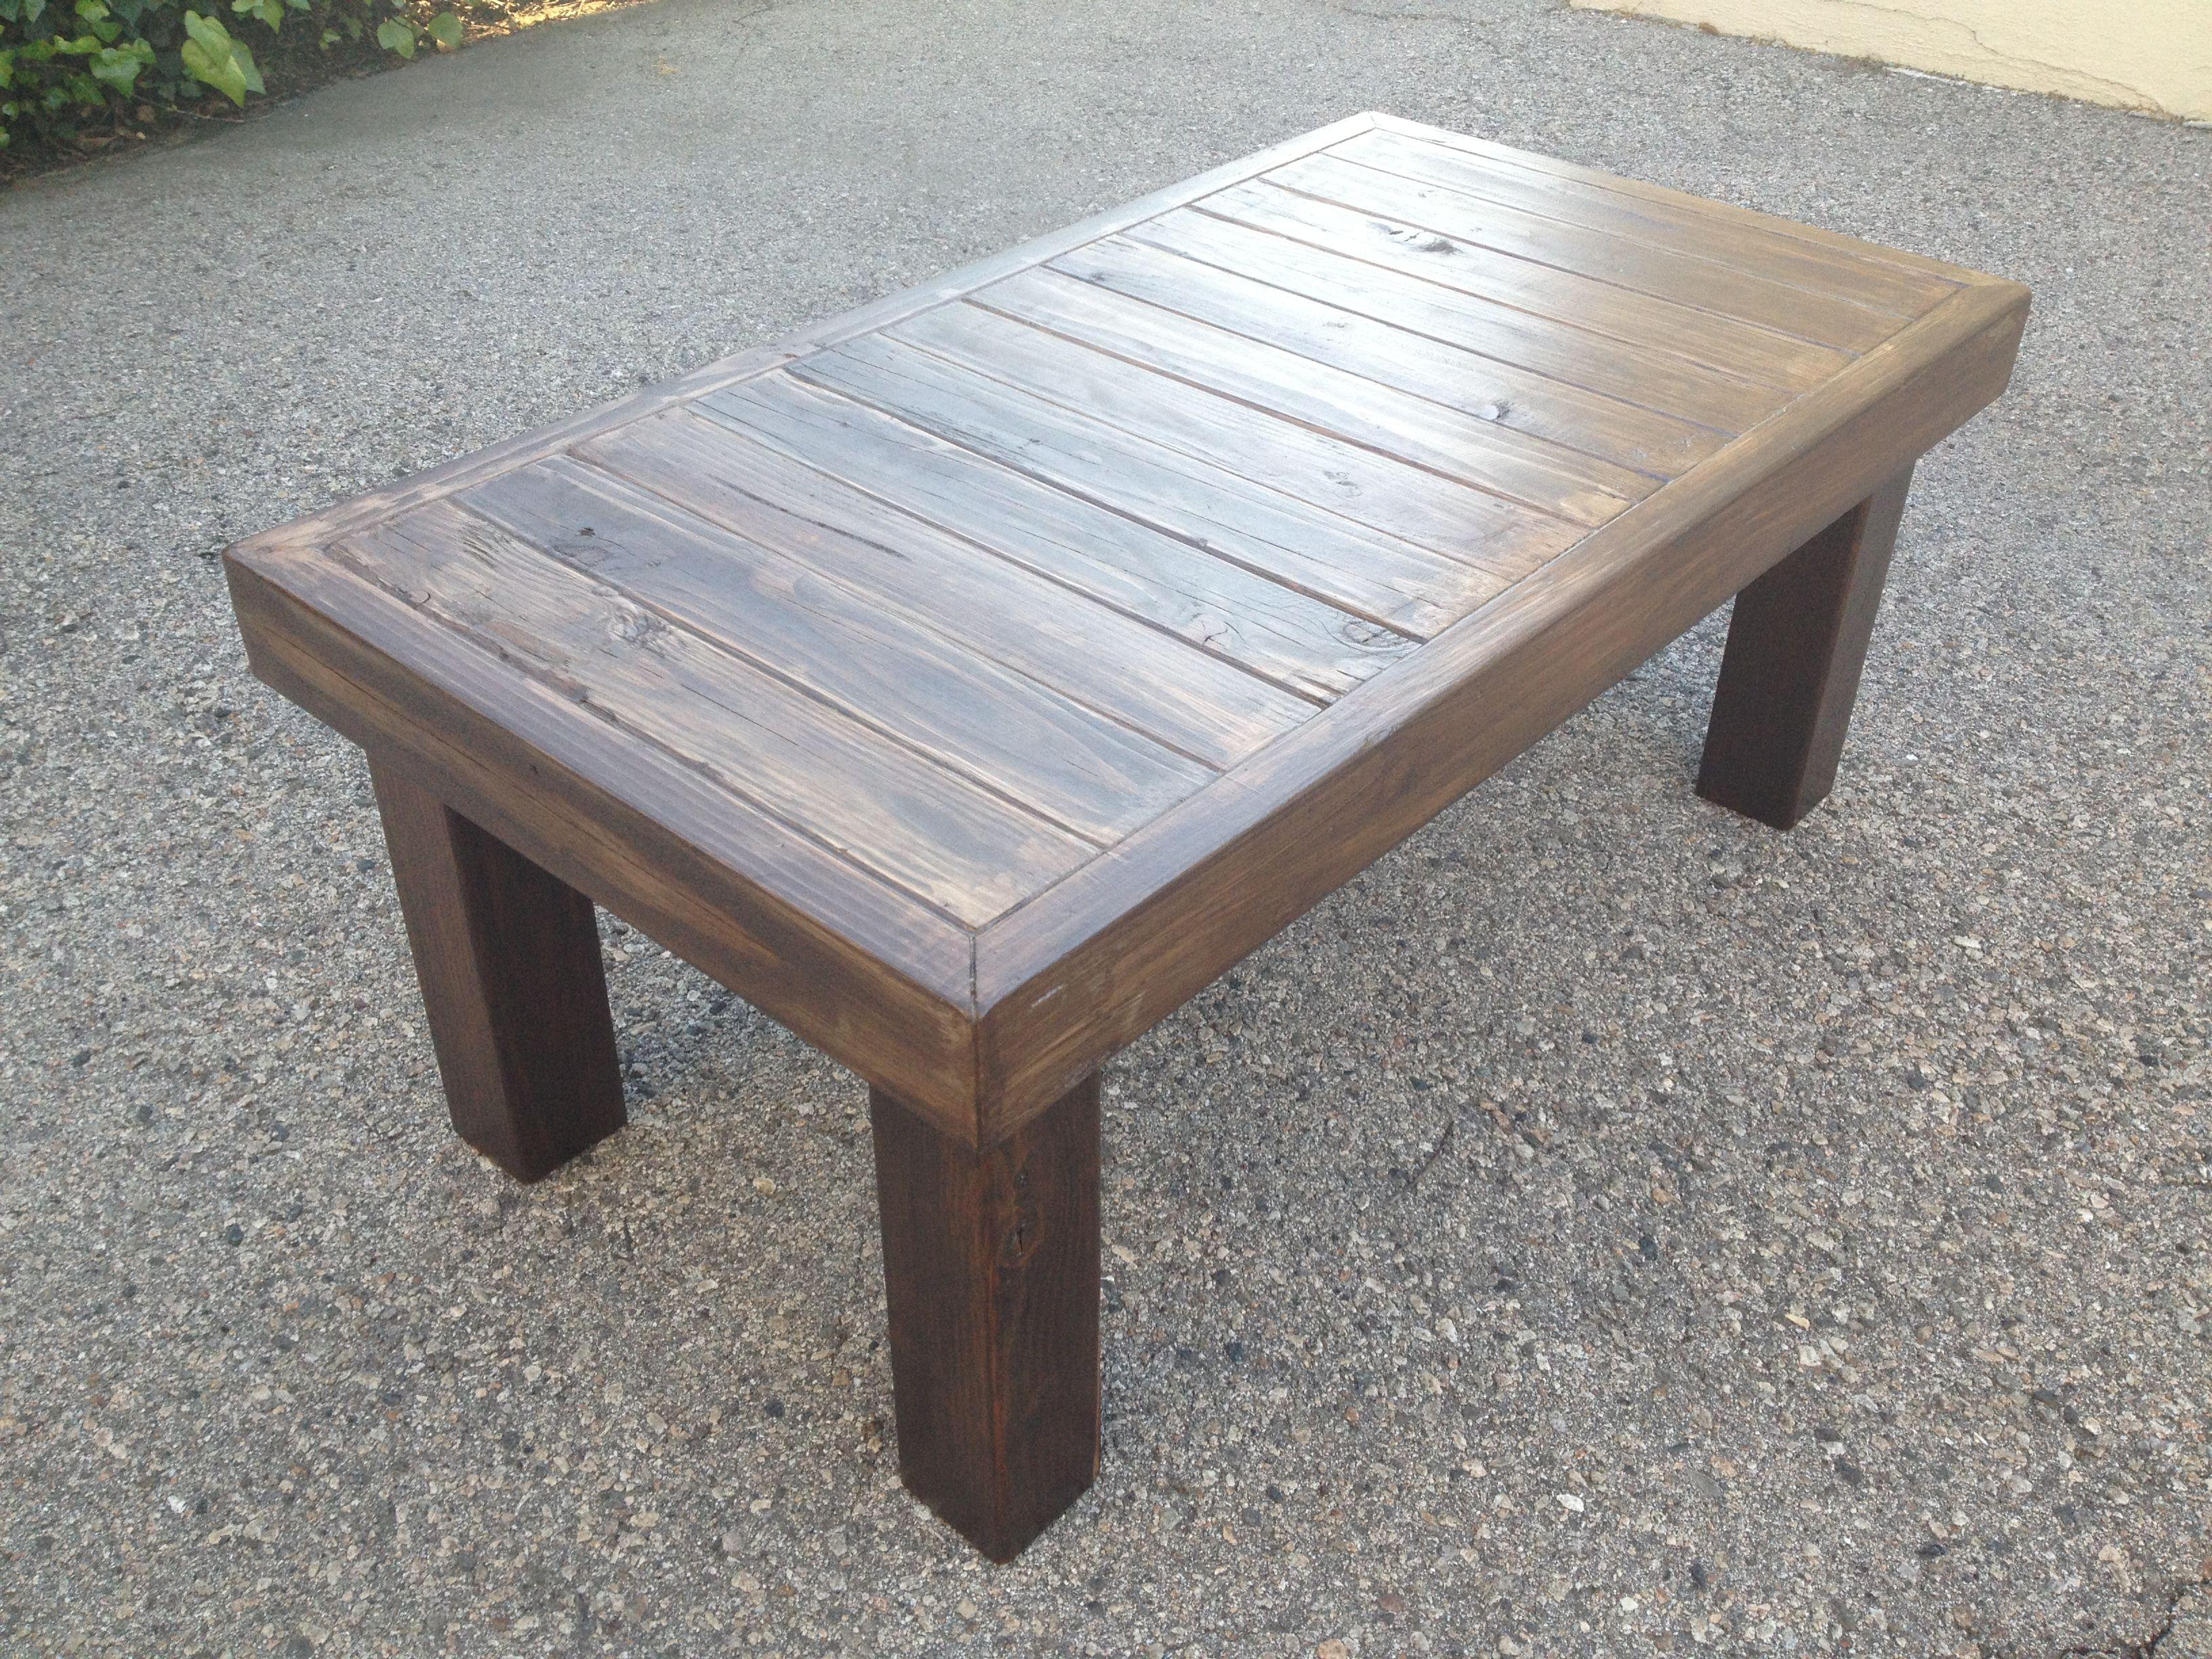 Great Custom Diy Rectangle Reclaimed Wood Table On Gray Cement Flooring As Patio Backyard Furn Coffee Table Wood Coffee Table Plans Reclaimed Wood Coffee Table [ 2448 x 3264 Pixel ]